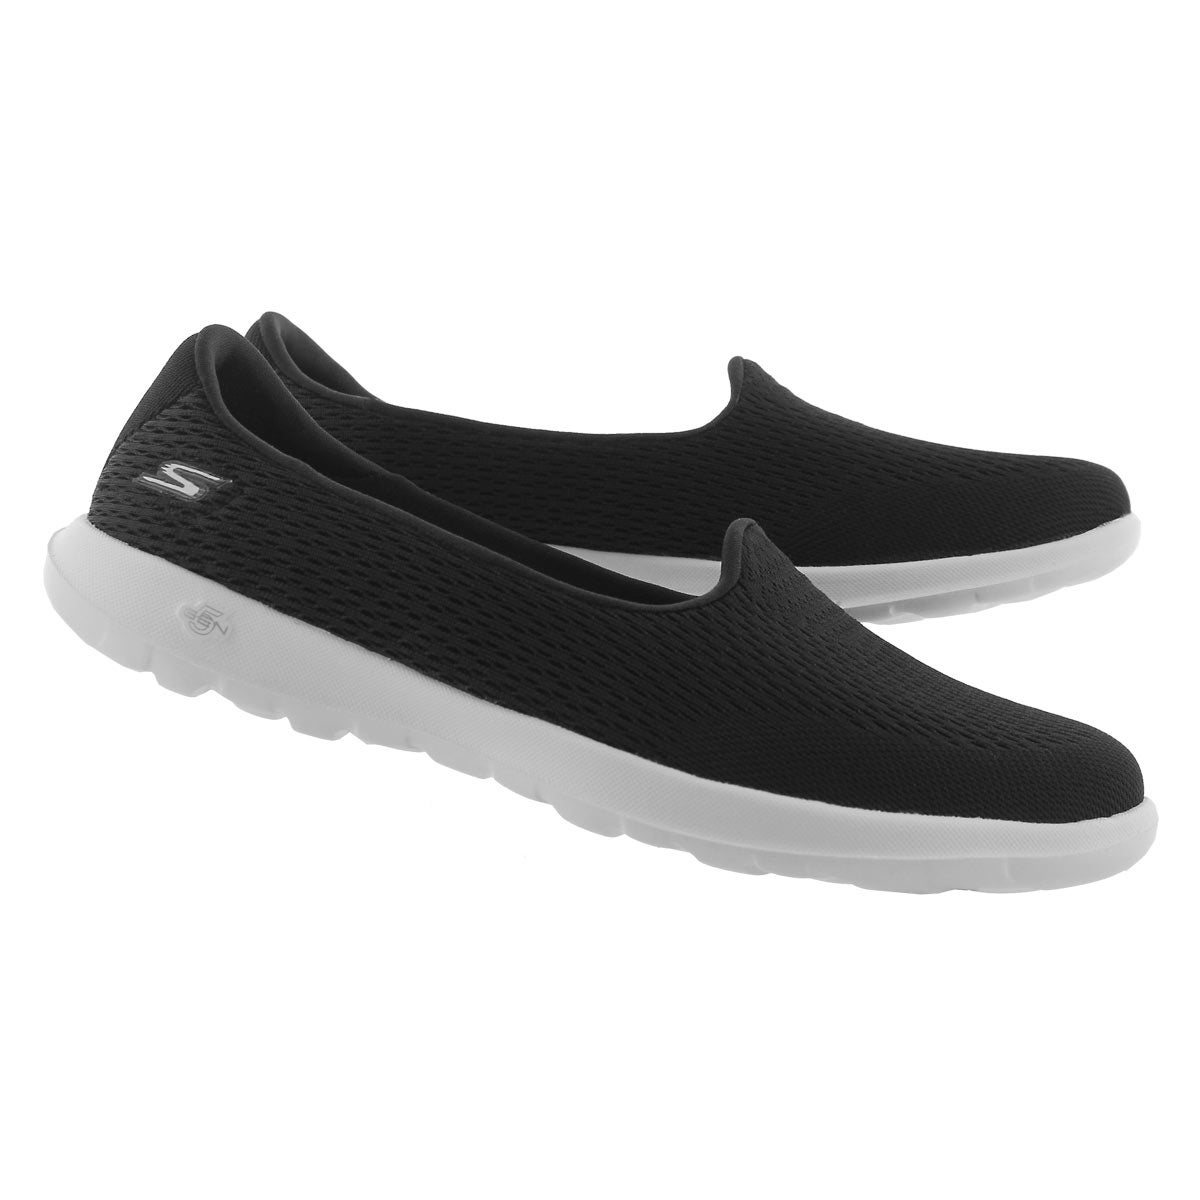 Lds GO Walk Lite blk/wht slip on shoe